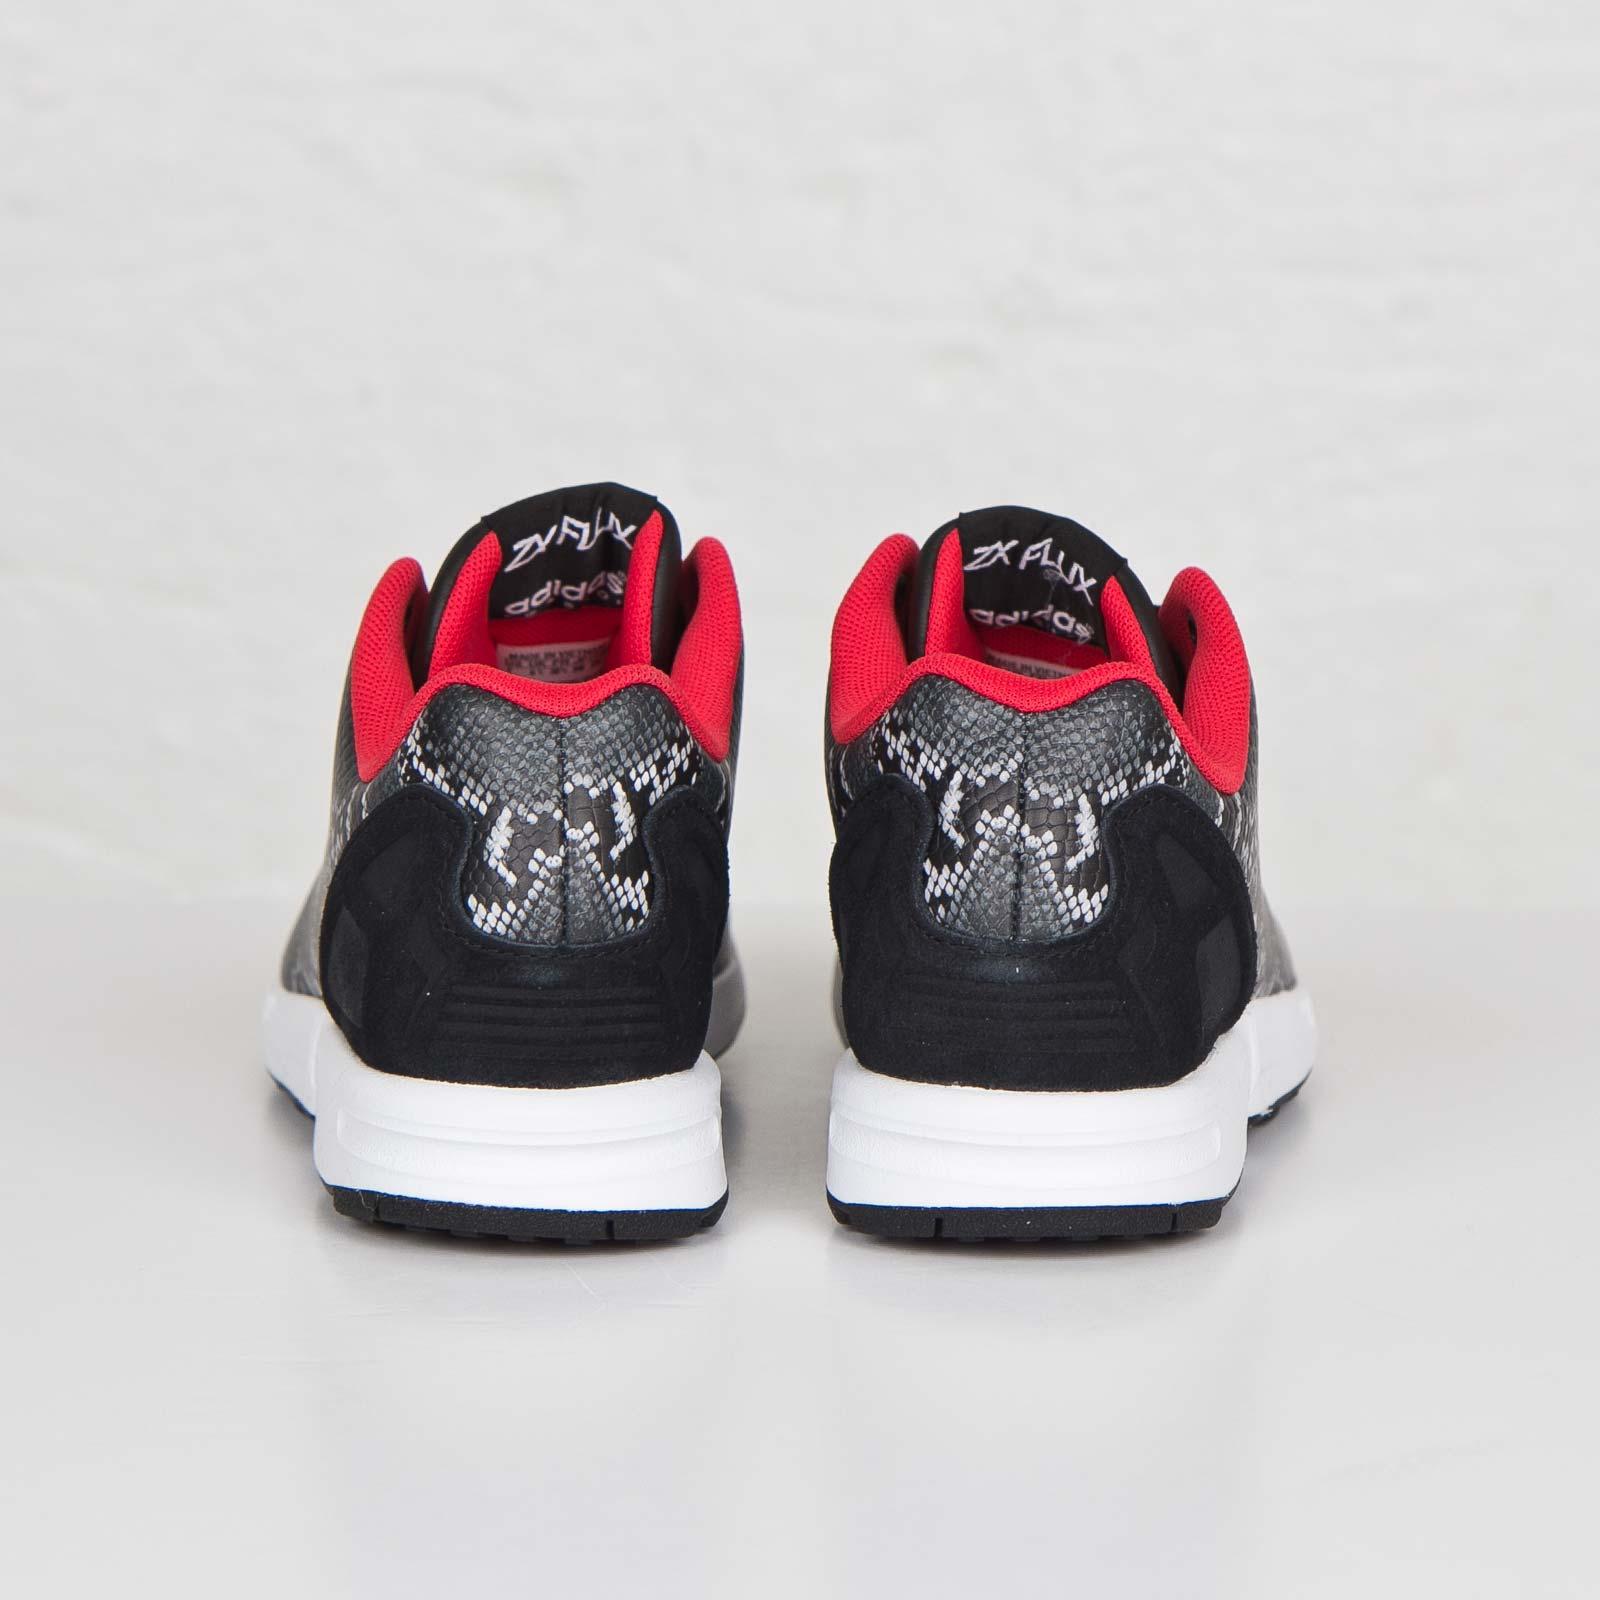 superior quality ed693 acf23 adidas ZX Flux W - B35310 - Sneakersnstuff   sneakers   streetwear online  since 1999